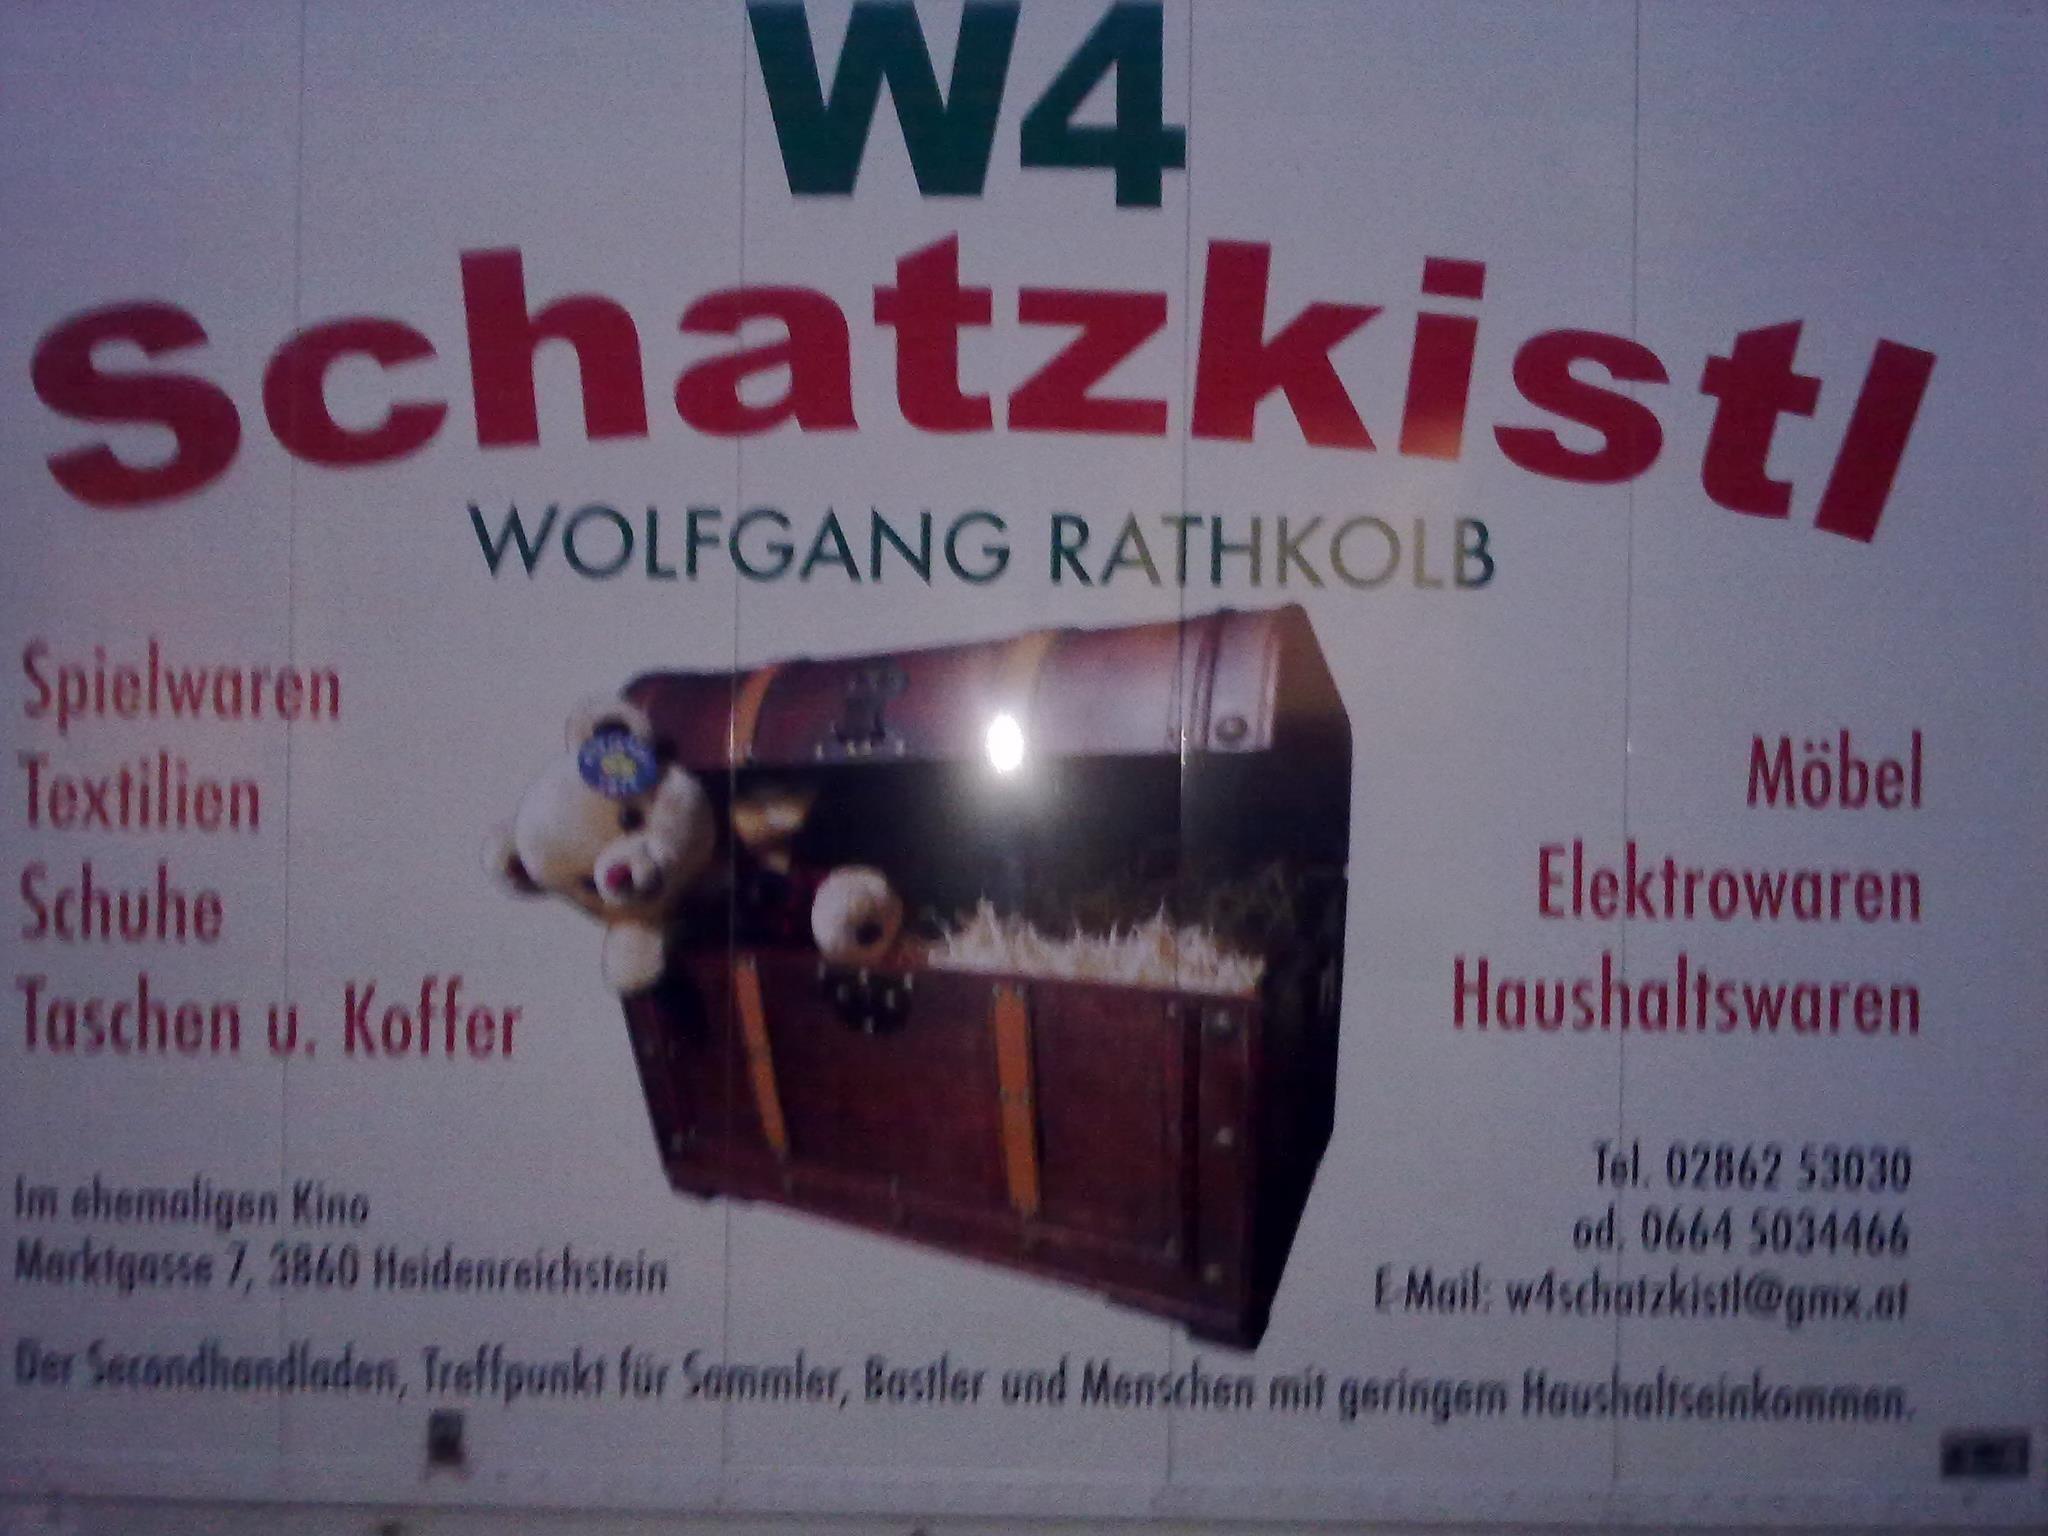 W4 Schatzkistl Wolfgang Rathkolb